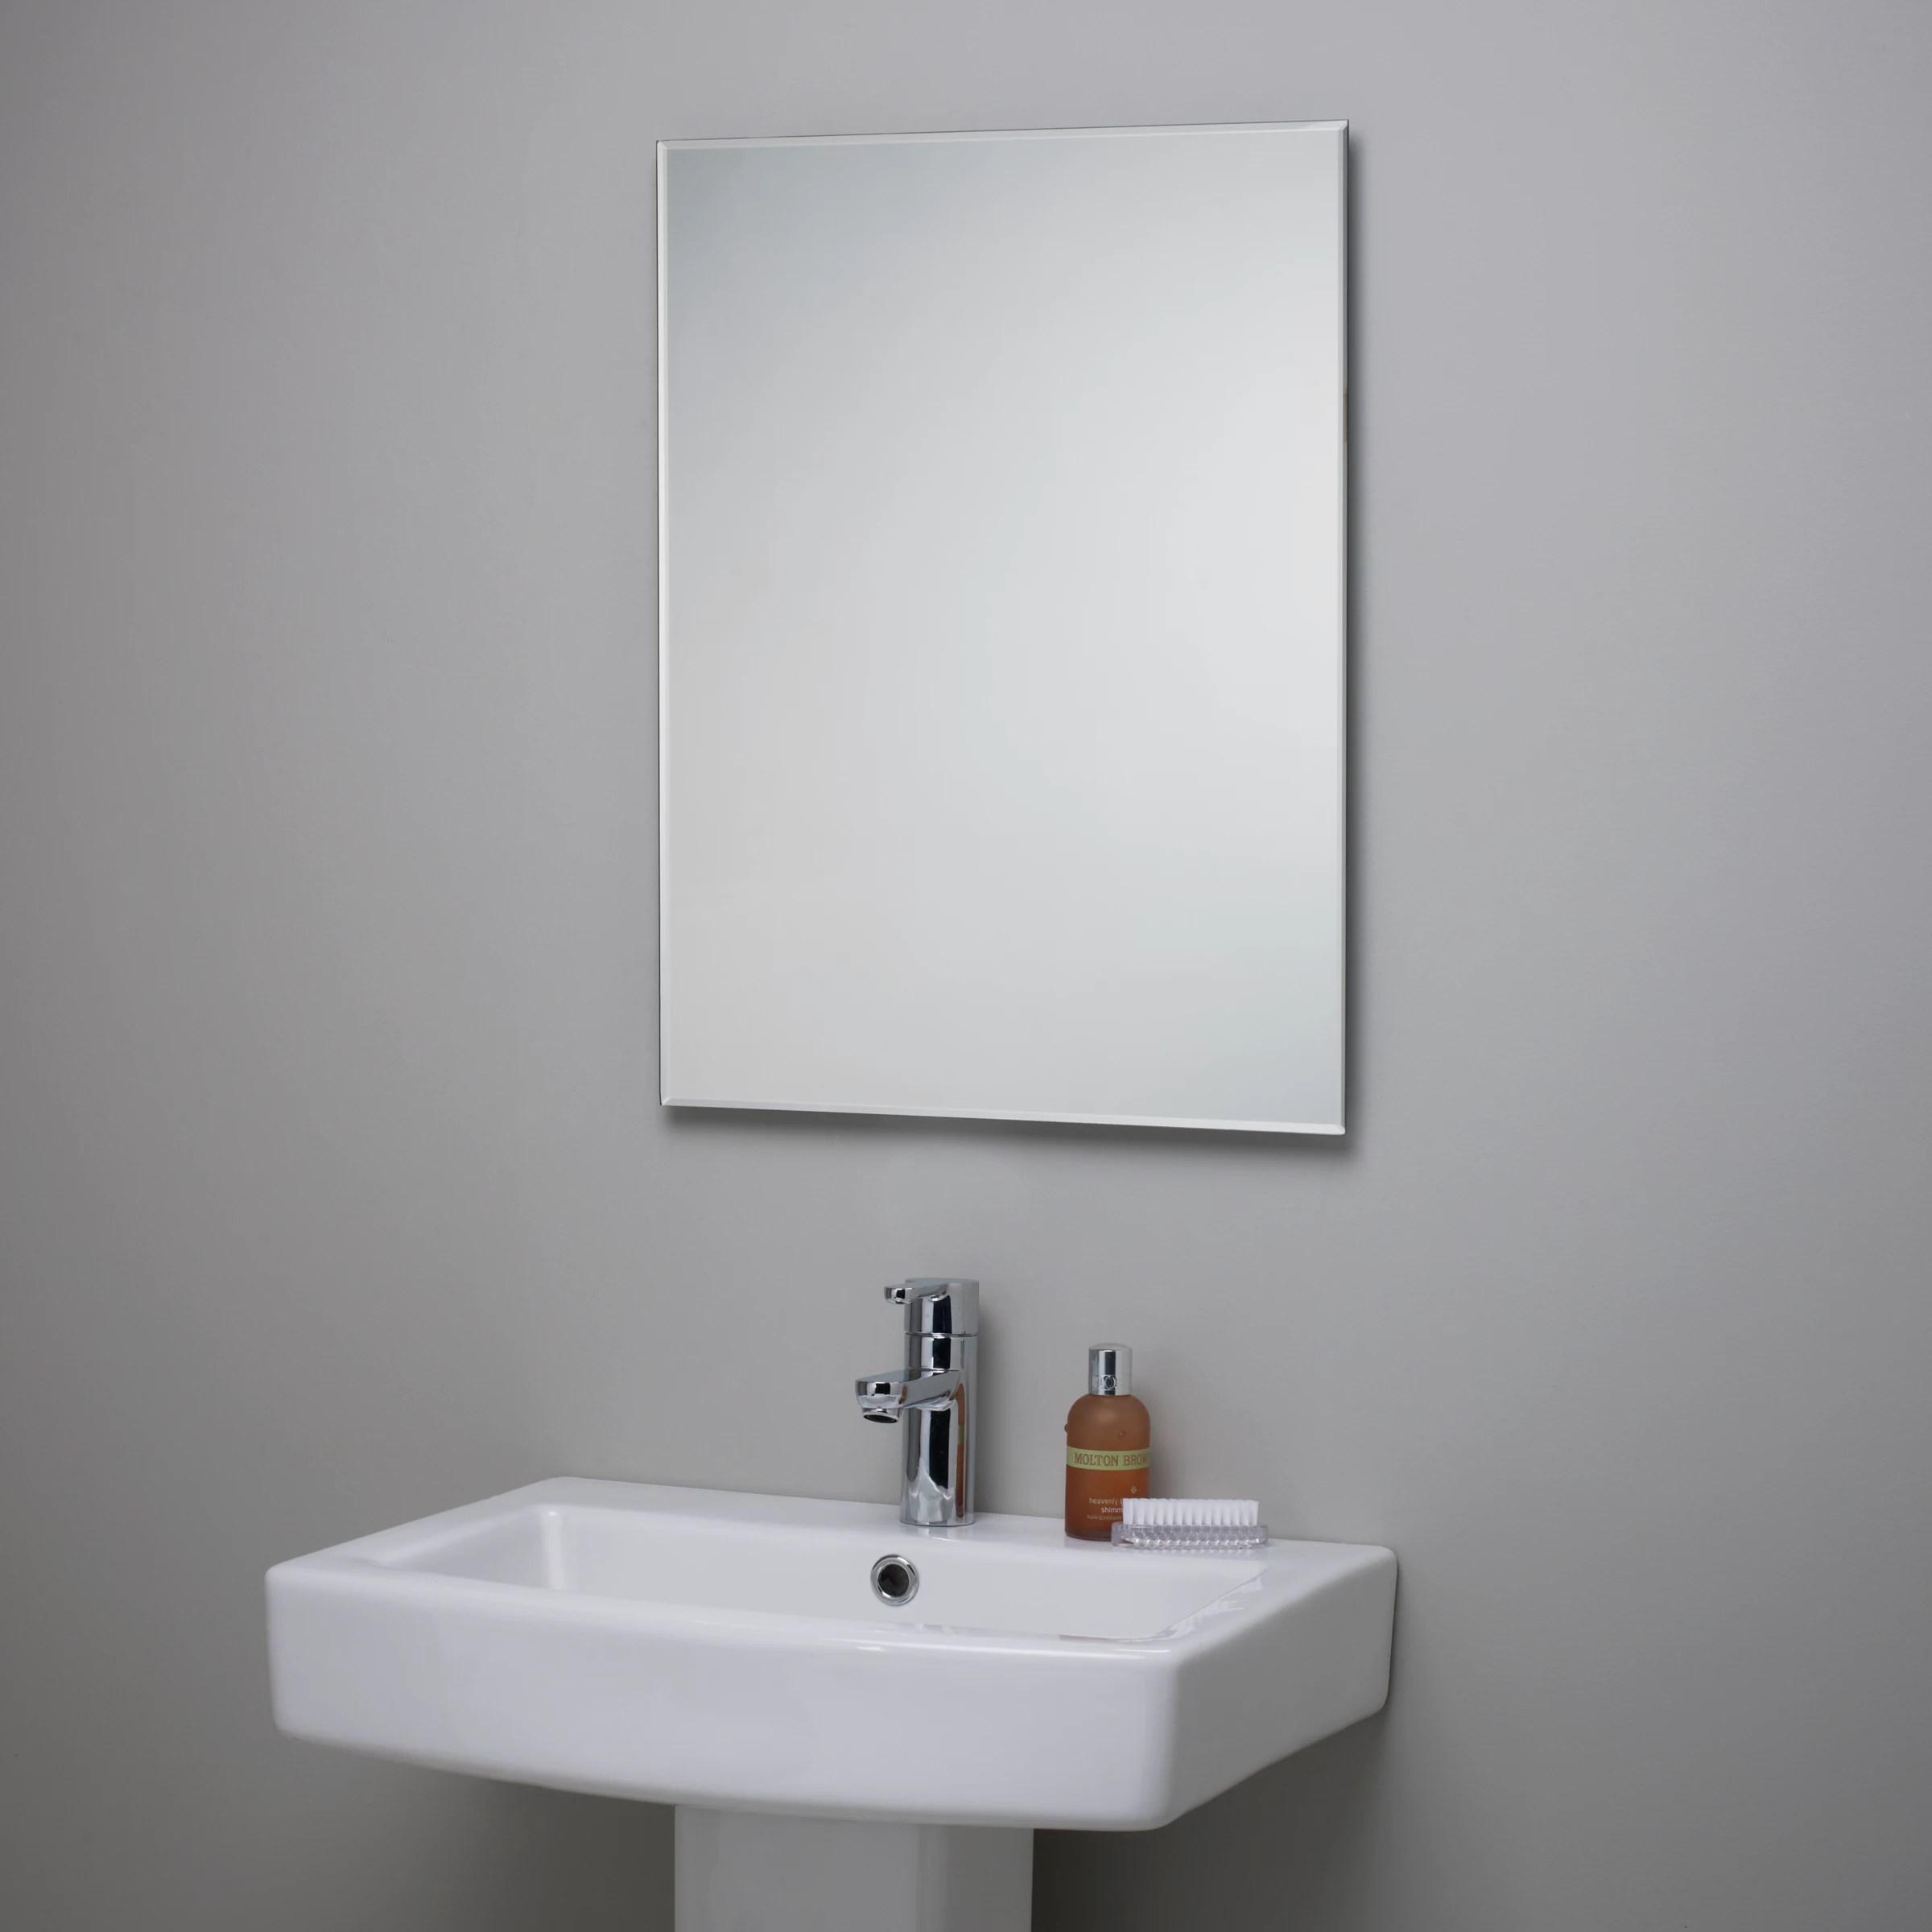 John Lewis Bevelled Edge Bathroom Mirror at John Lewis